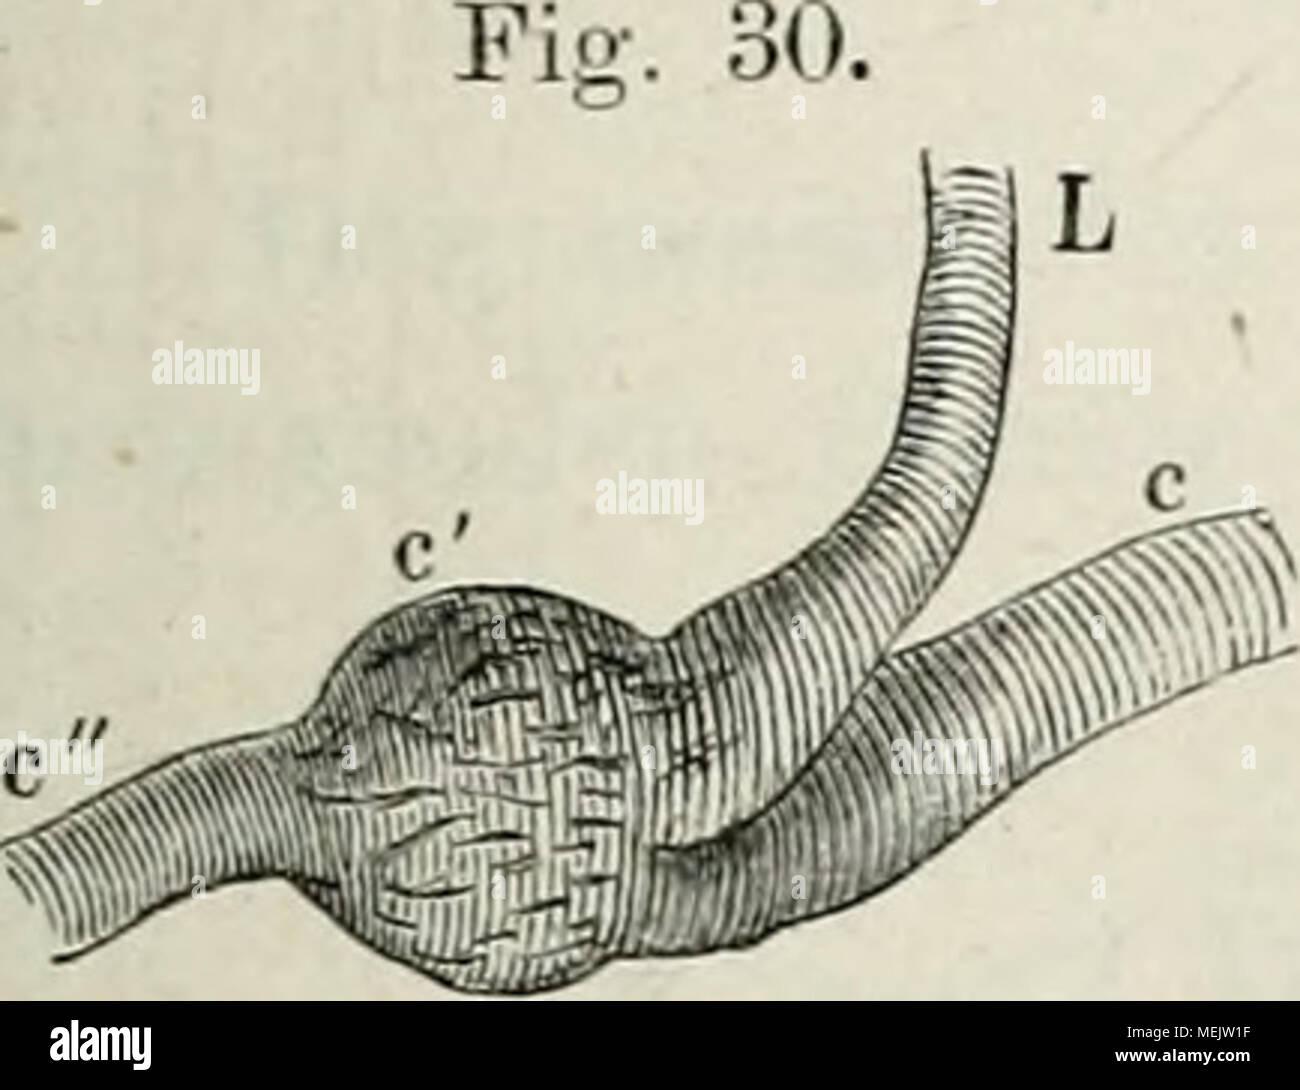 Arterien Stockfotos & Arterien Bilder - Alamy